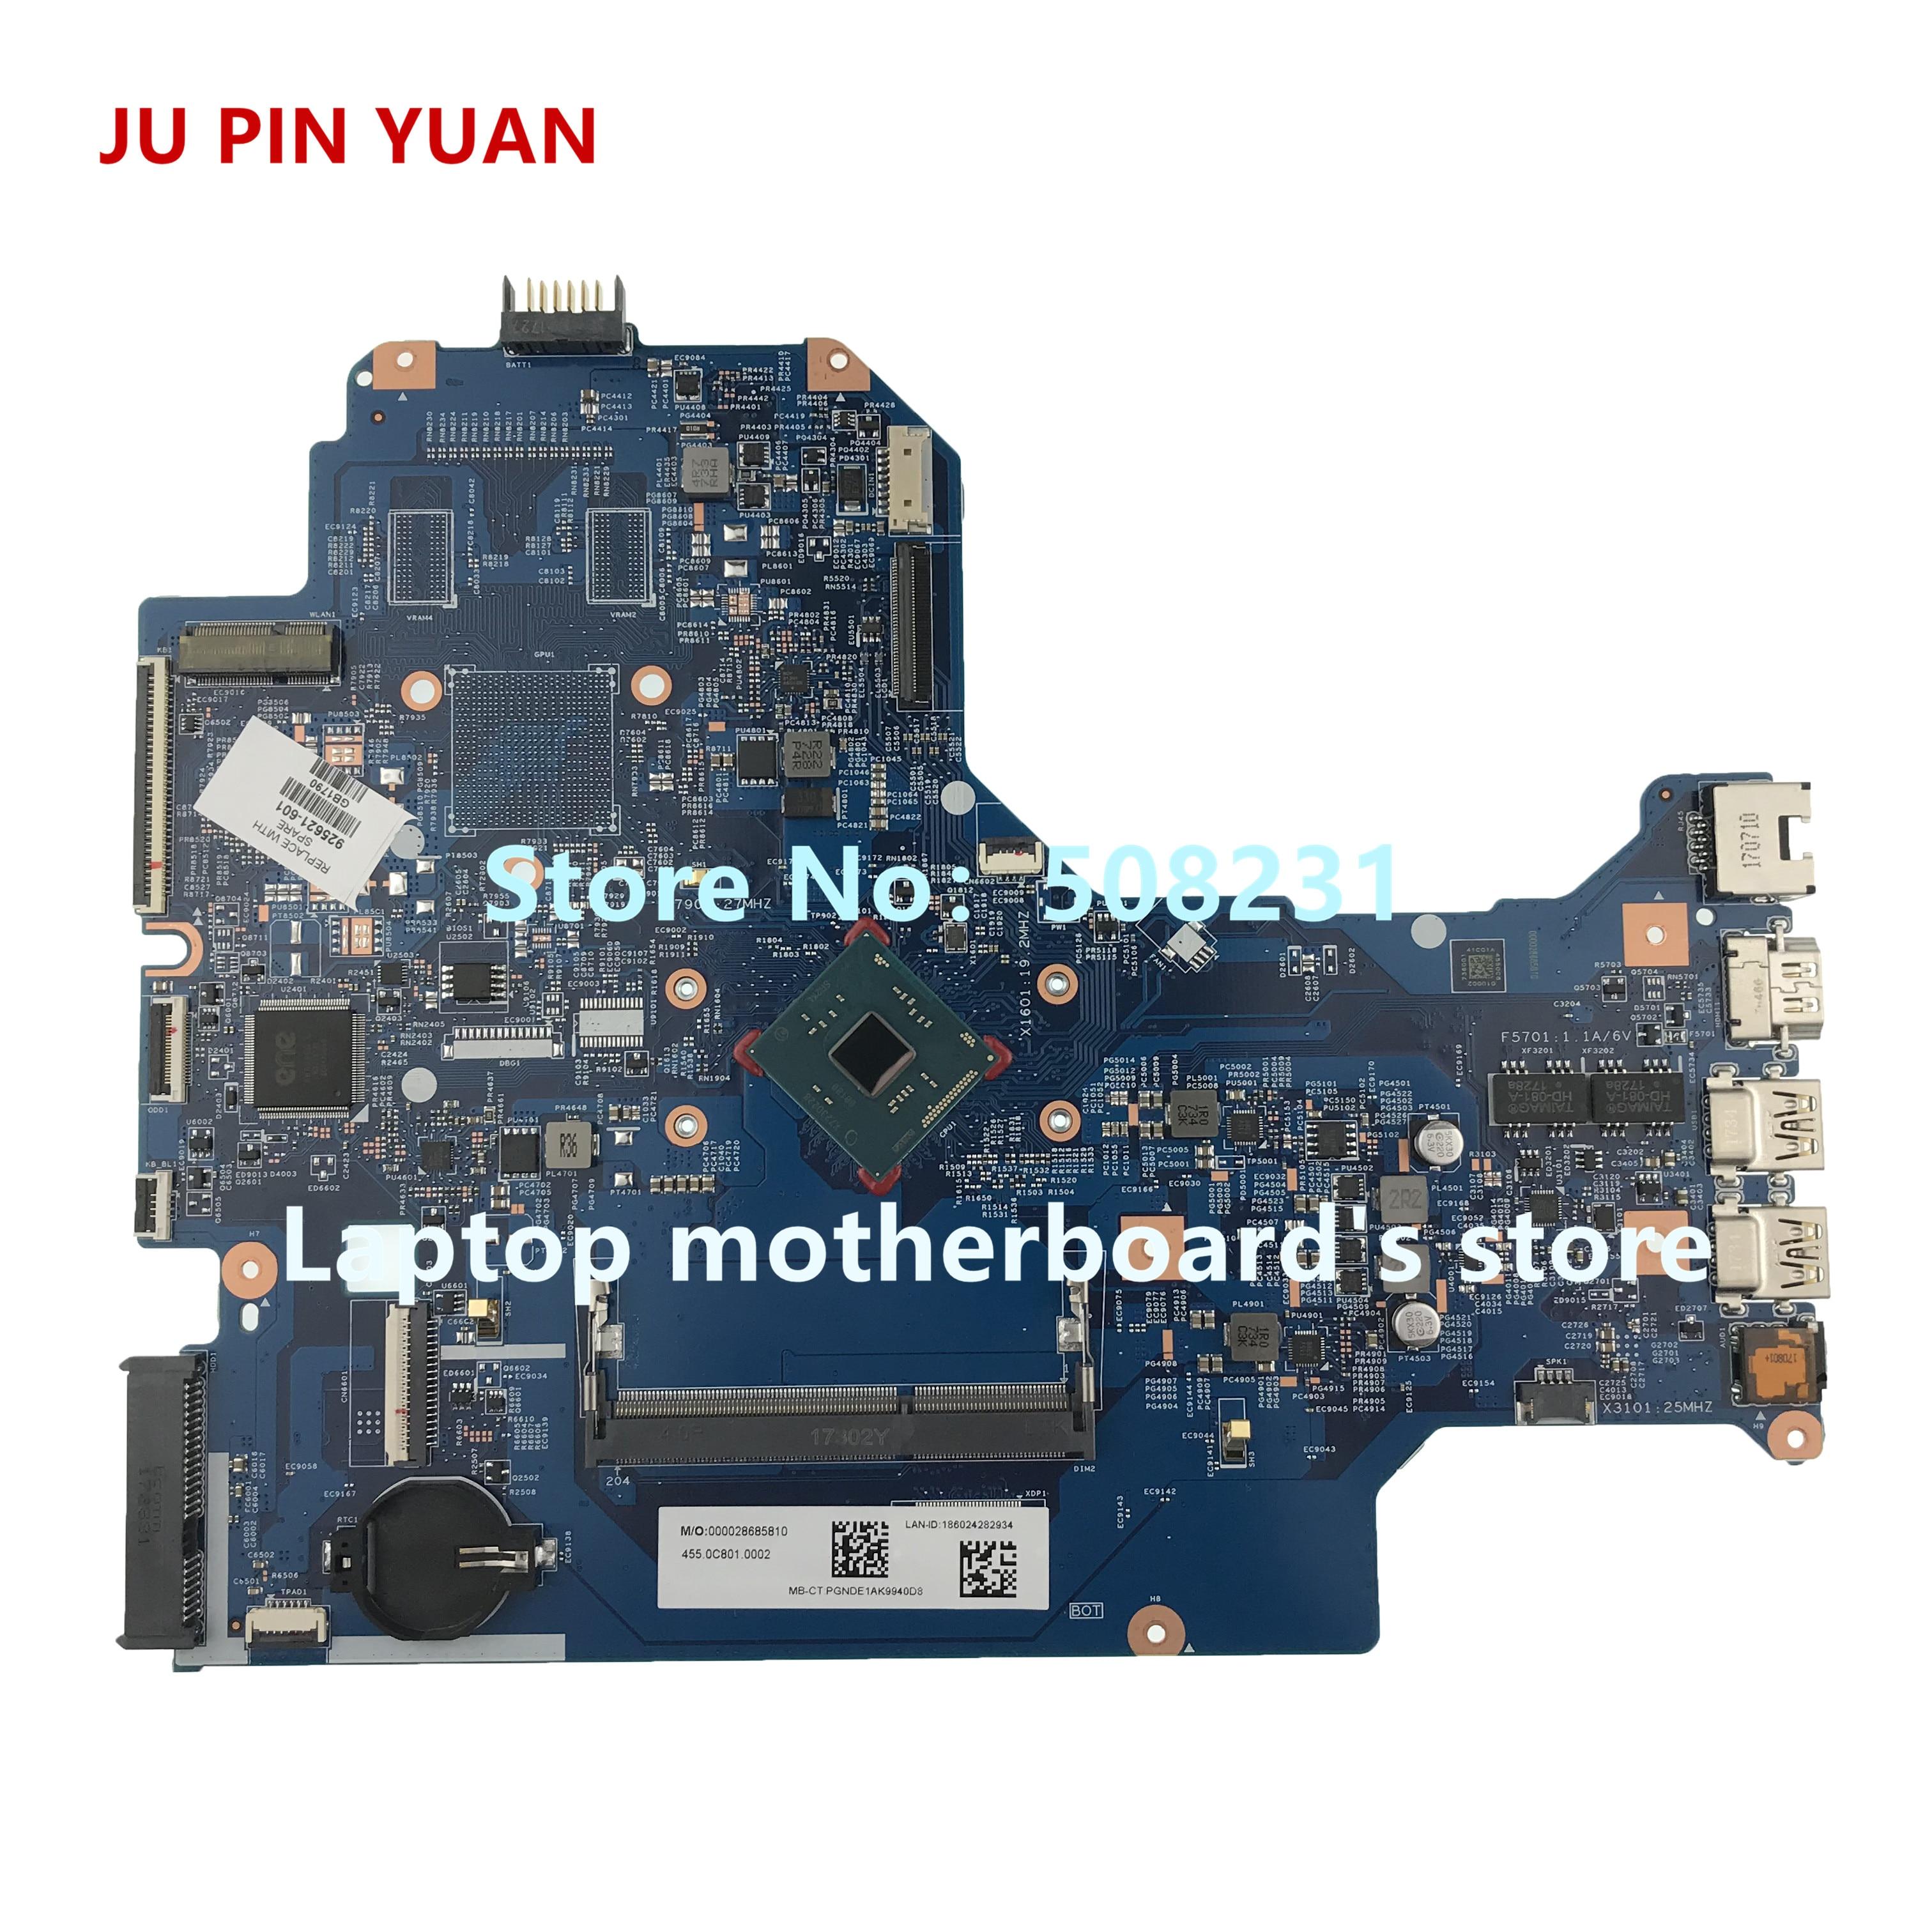 JU PIN YUAN-اللوحة الأم للكمبيوتر المحمول HP ، اللوحة الأم للكمبيوتر المحمول HP 17-BS 17-BS001DS ، تم اختبارها بالكامل ، 925621-601 925621-001 448.0C81.0011